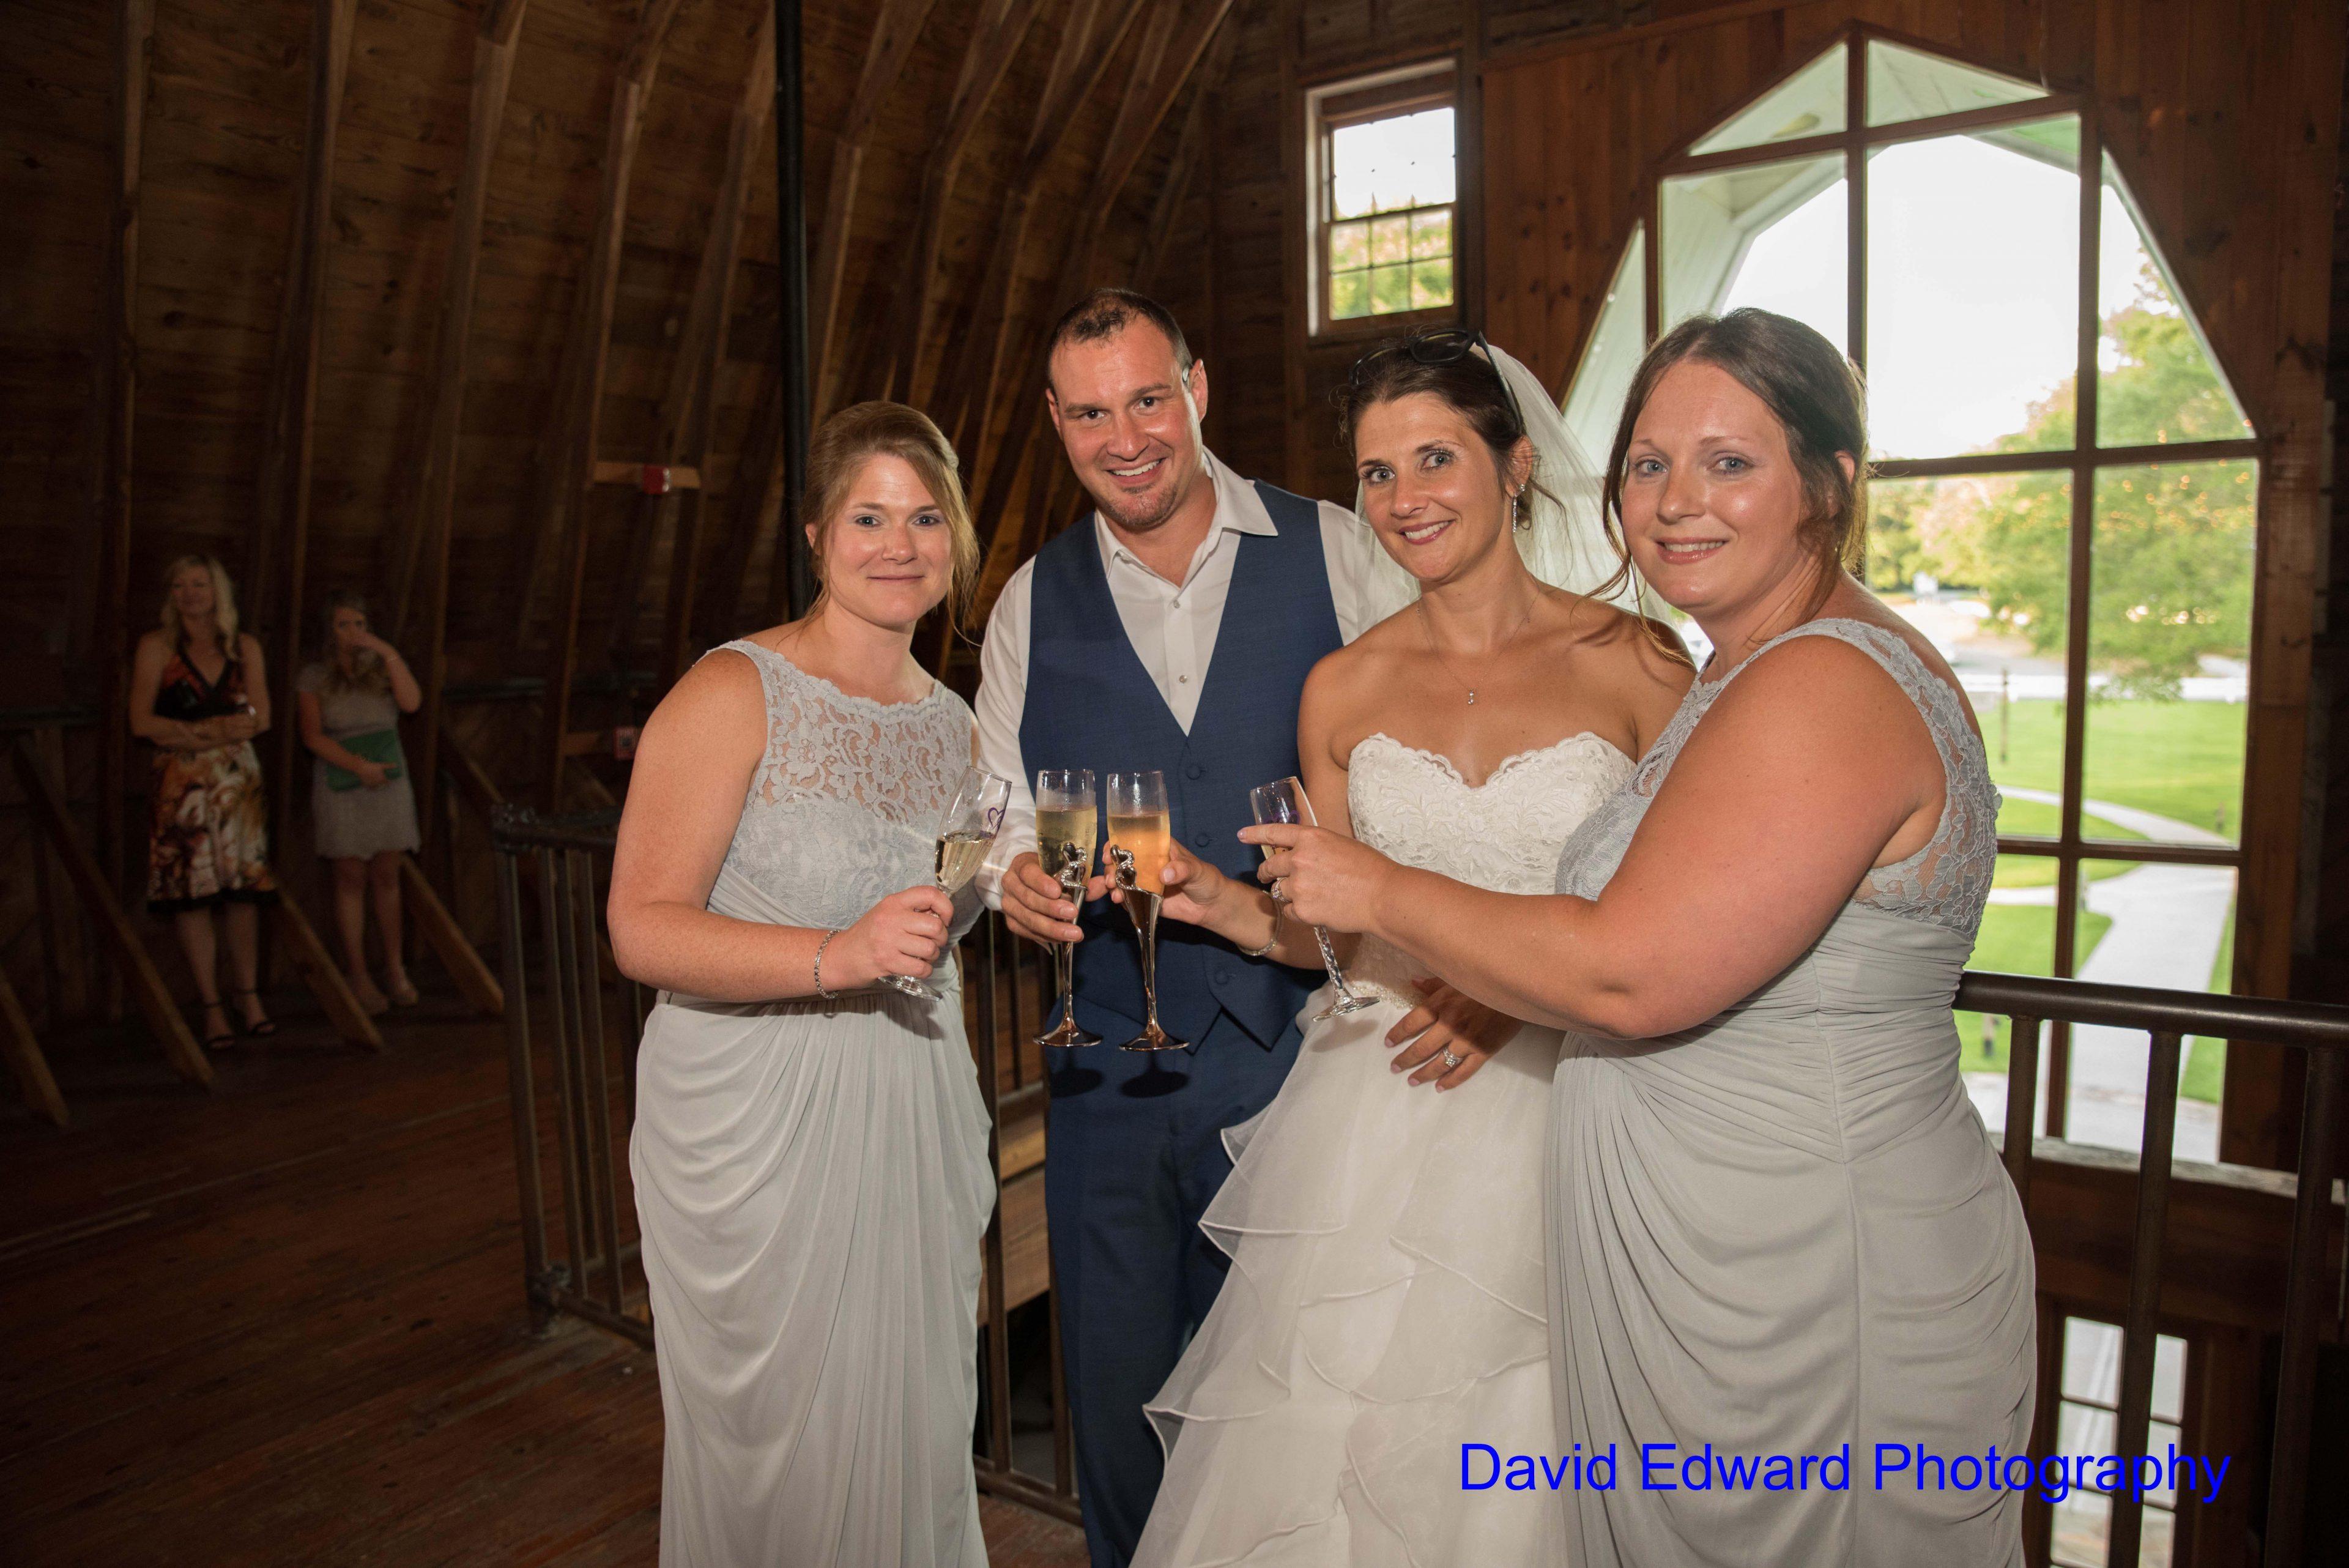 Magnificent Moments Weddings Dairy Barn David Edward Photography(15) Min